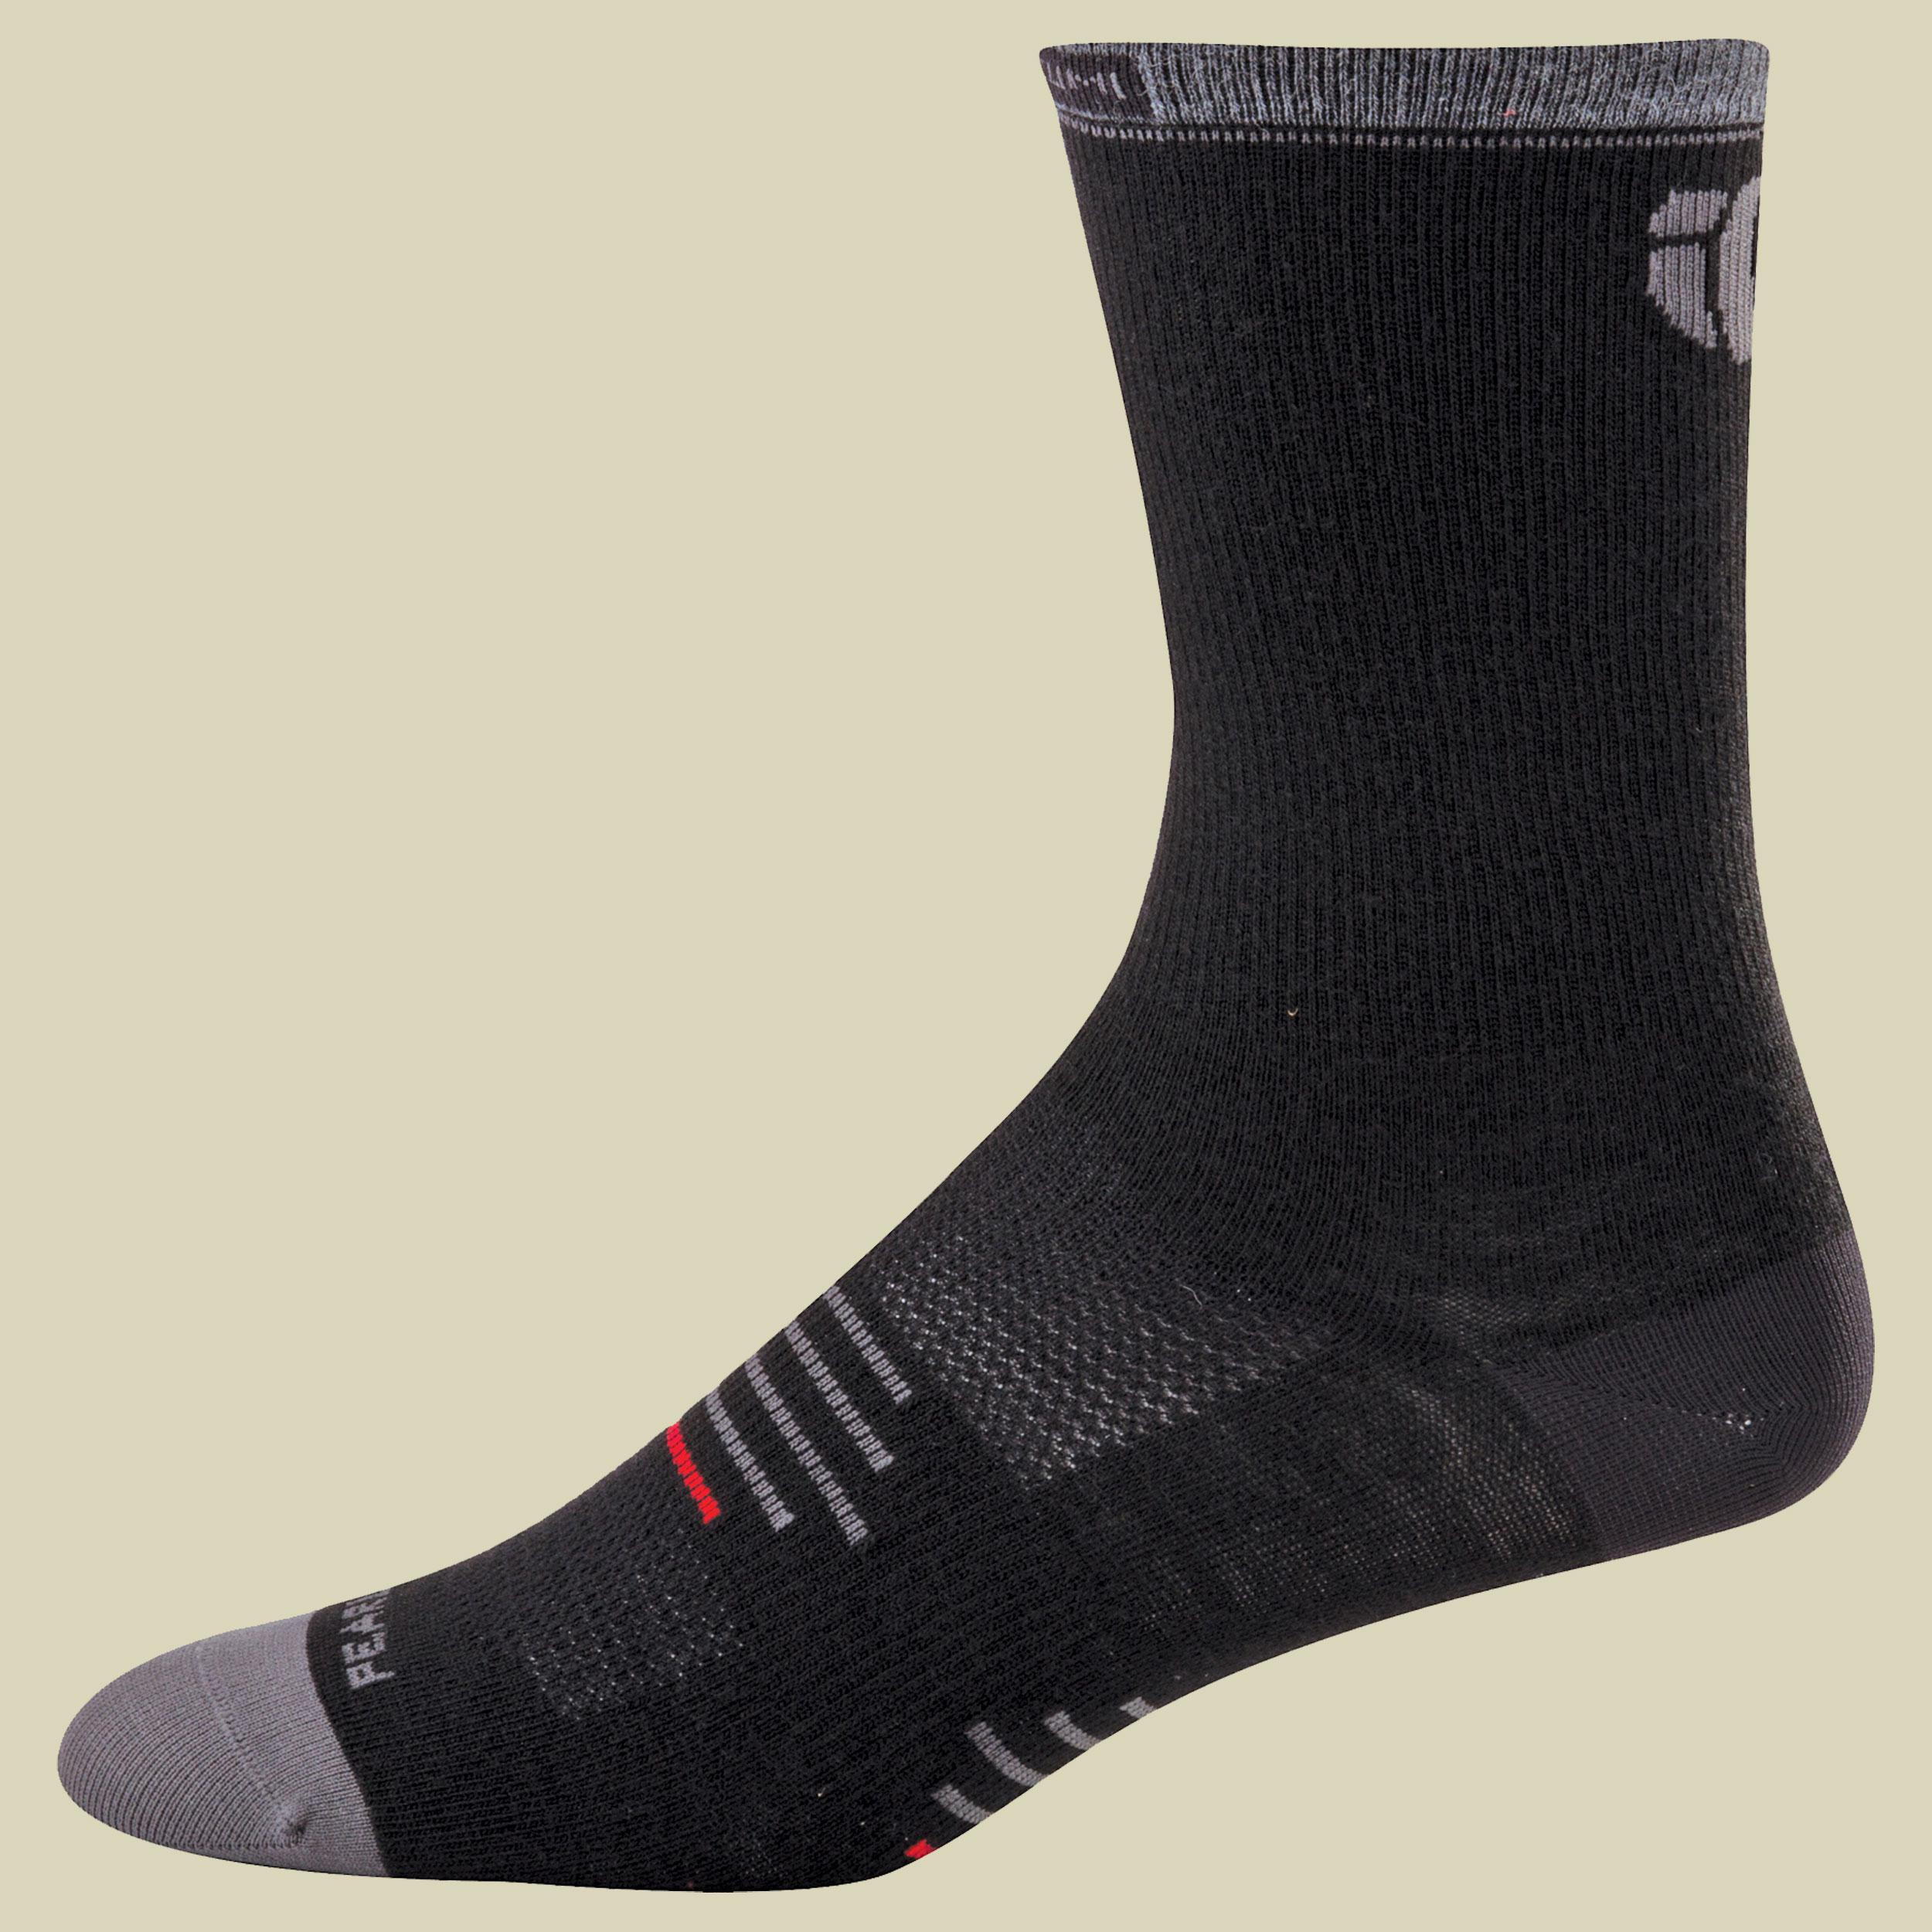 Pearl Izumi Elite Tall Wool Sock Fahrradsocken Größe S black